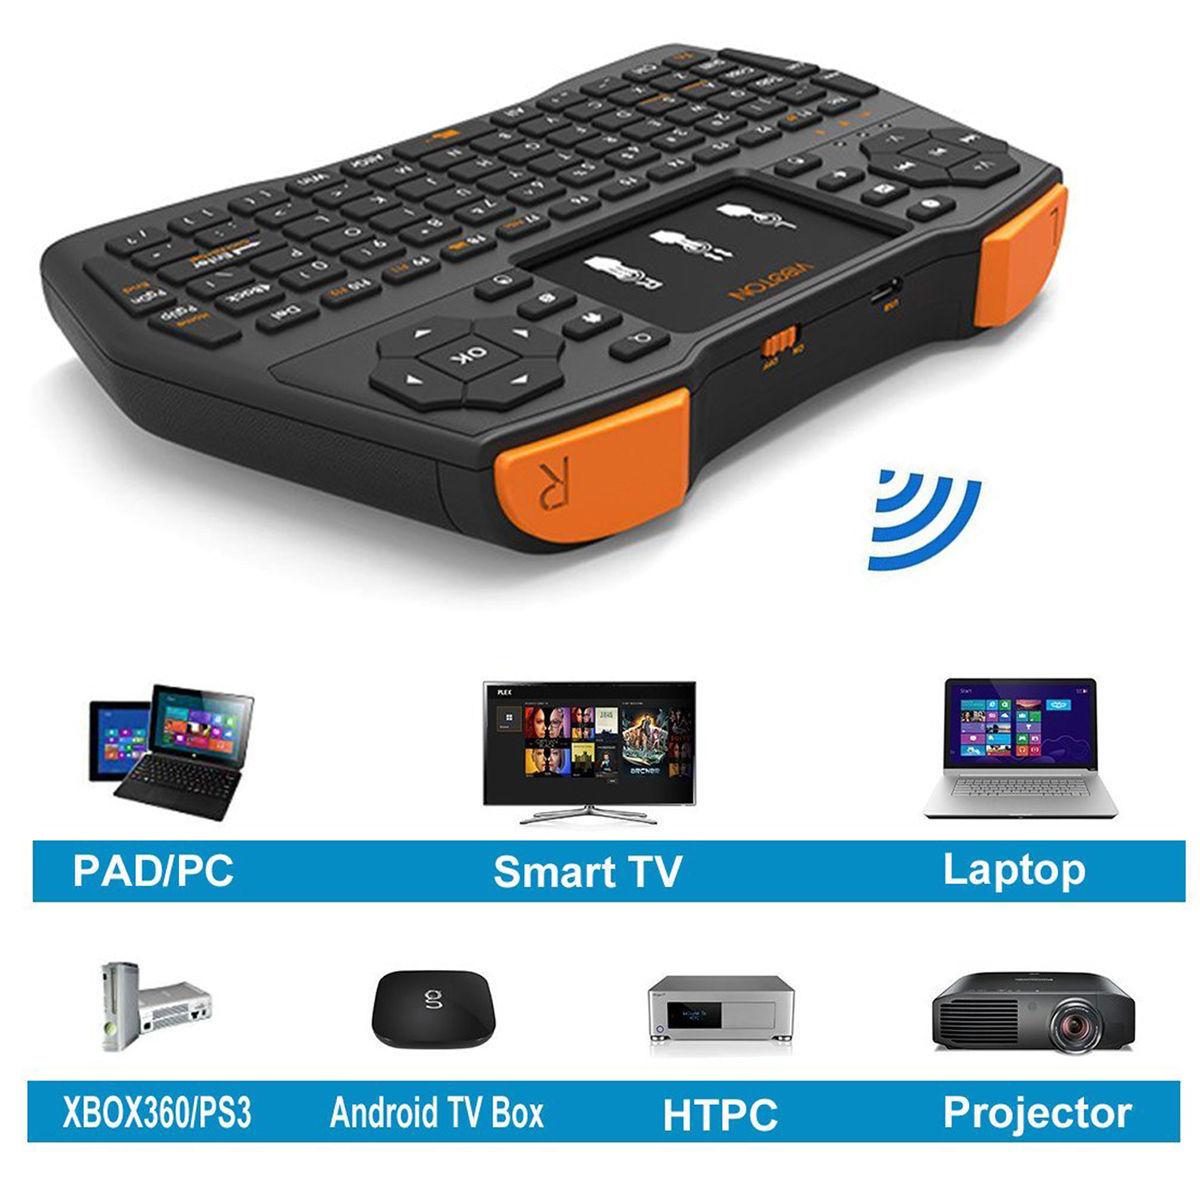 Black Wireless Mini Ultra Slim Keyboard and Mouse For Easy Smart TV Contol for VIZIO M70-C3 Smart TV